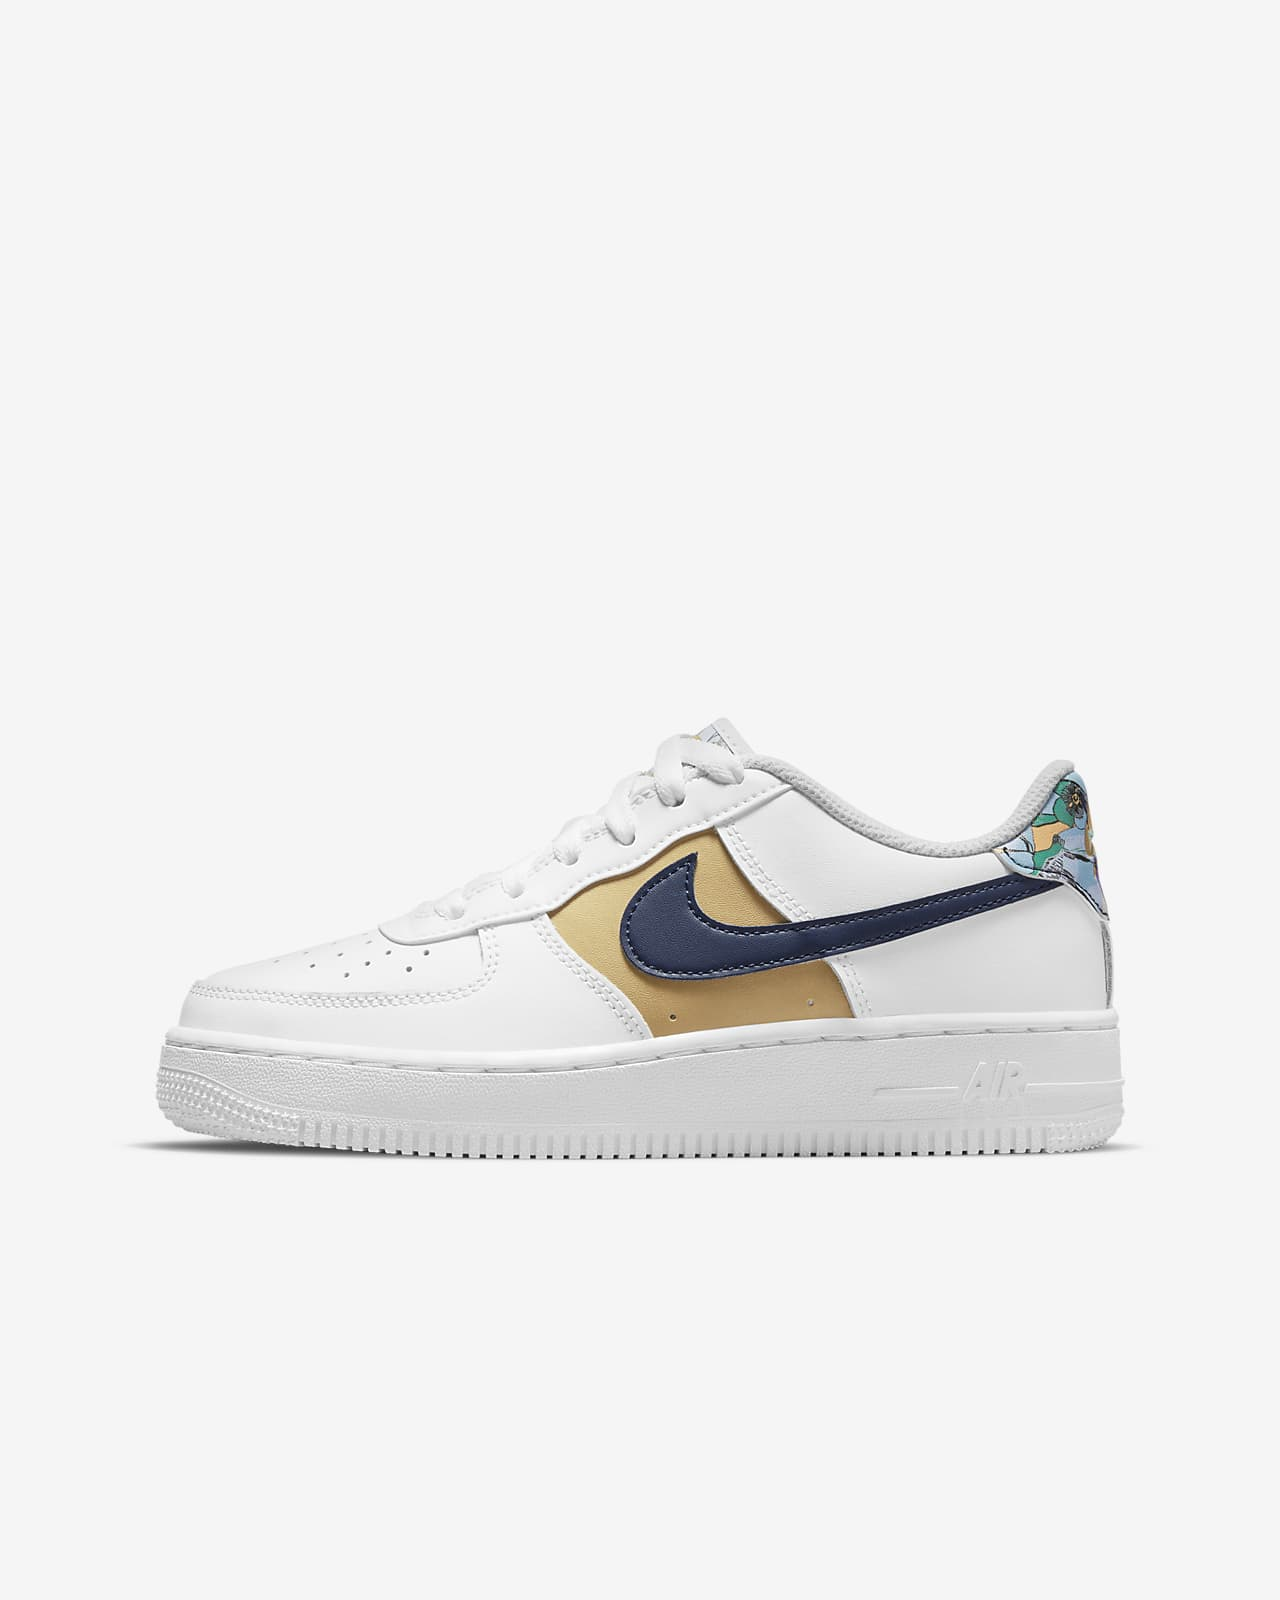 Nike Air Force 1 Low LV8 Big Kids' Shoe